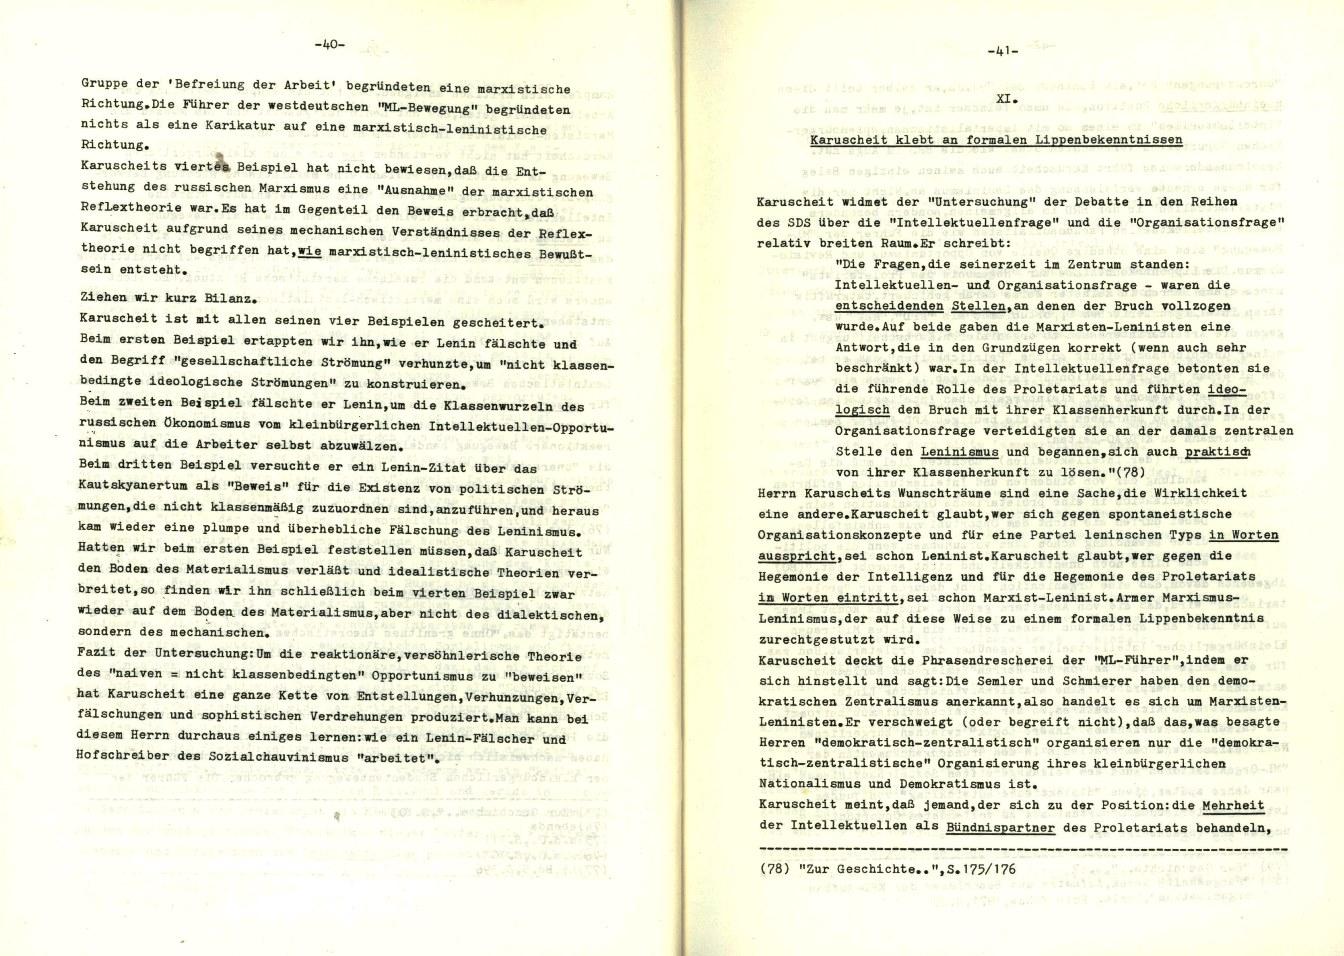 Muenchen_Kampf_dem_Revisionismus_1979_09_21